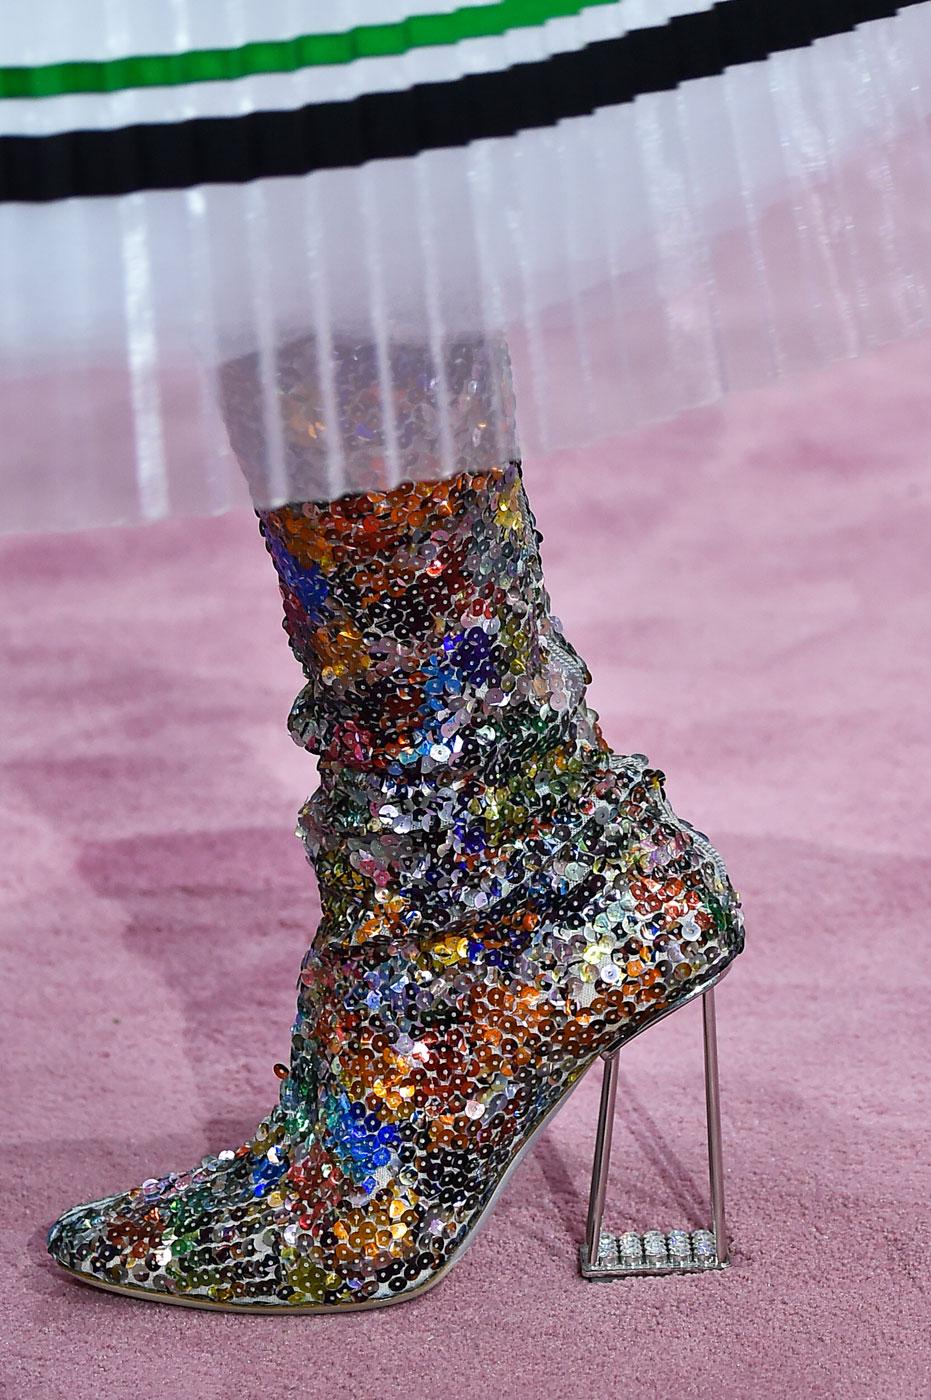 Christian-Dior-fashion-runway-show-close-ups-haute-couture-paris-spring-summer-2015-the-impression-183